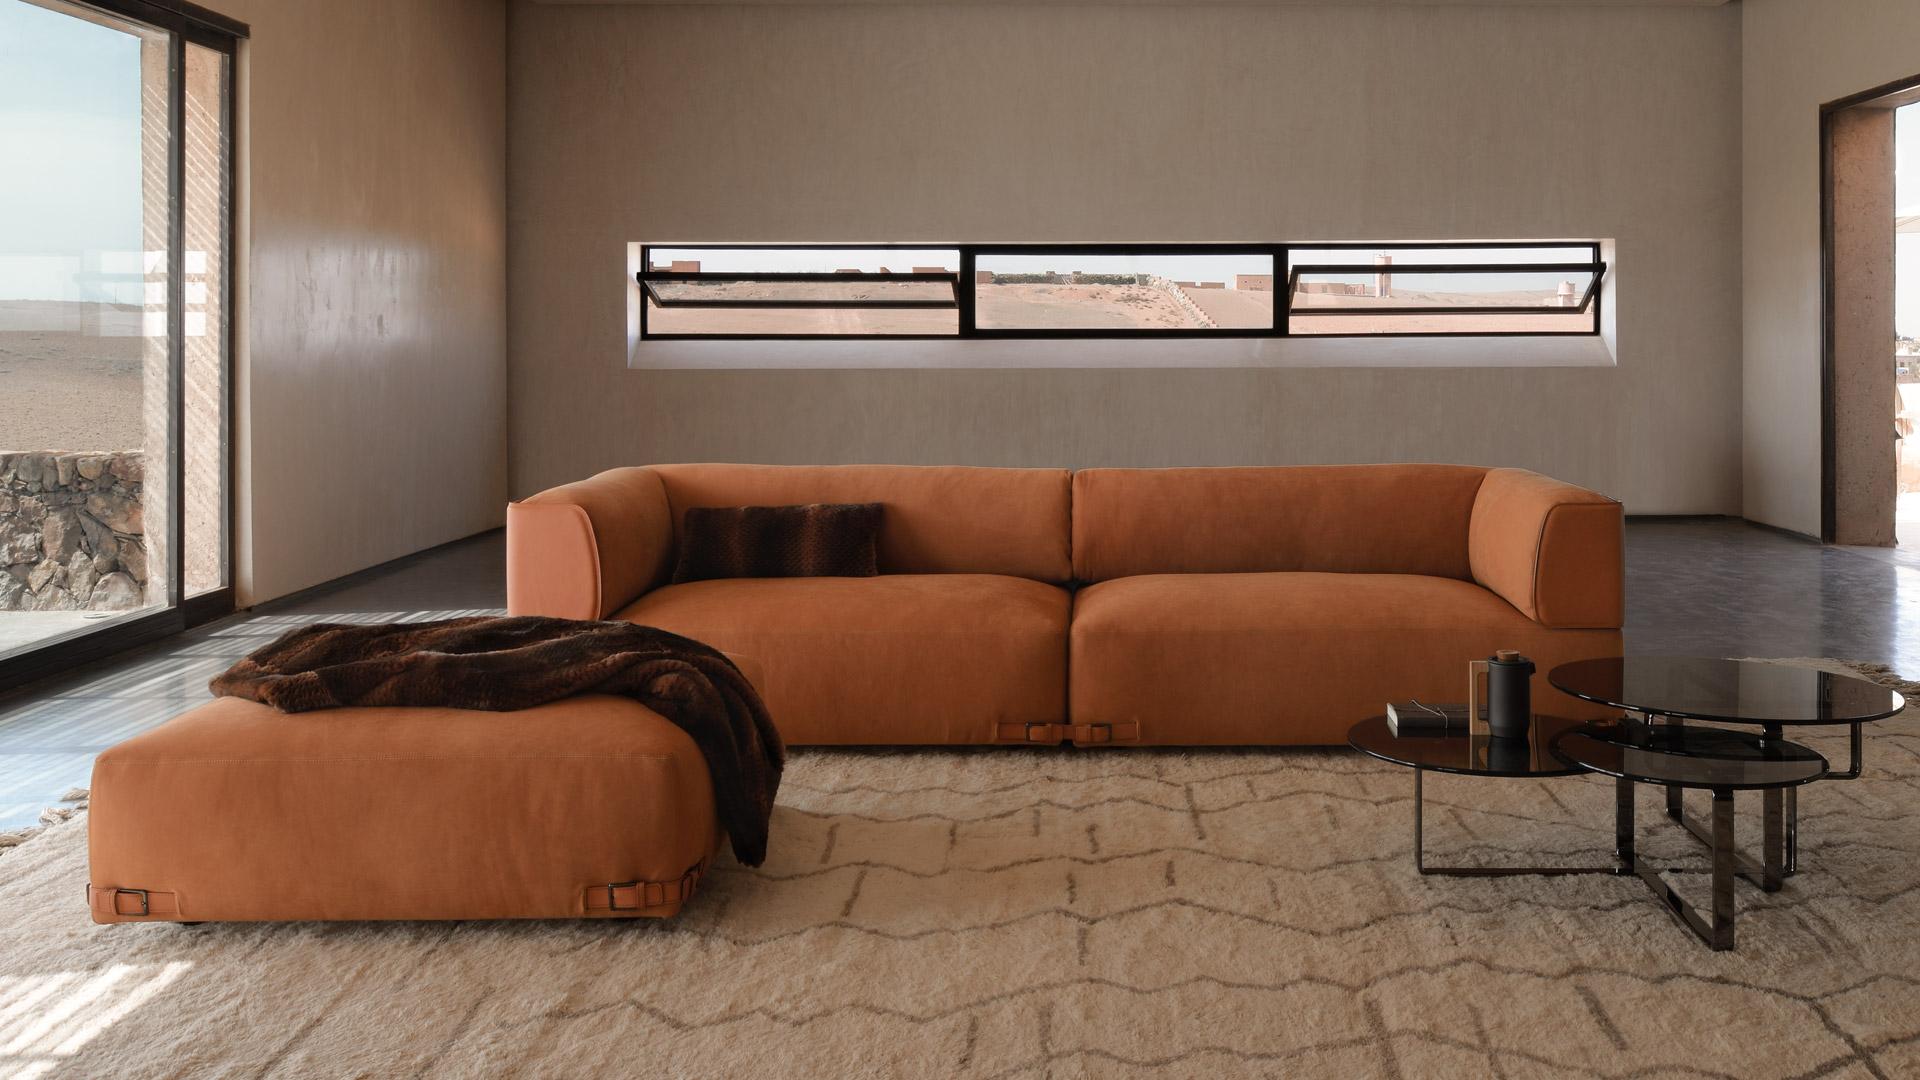 Divani fendi 2013 6 design mon amour - Fendi casa prezzi ...